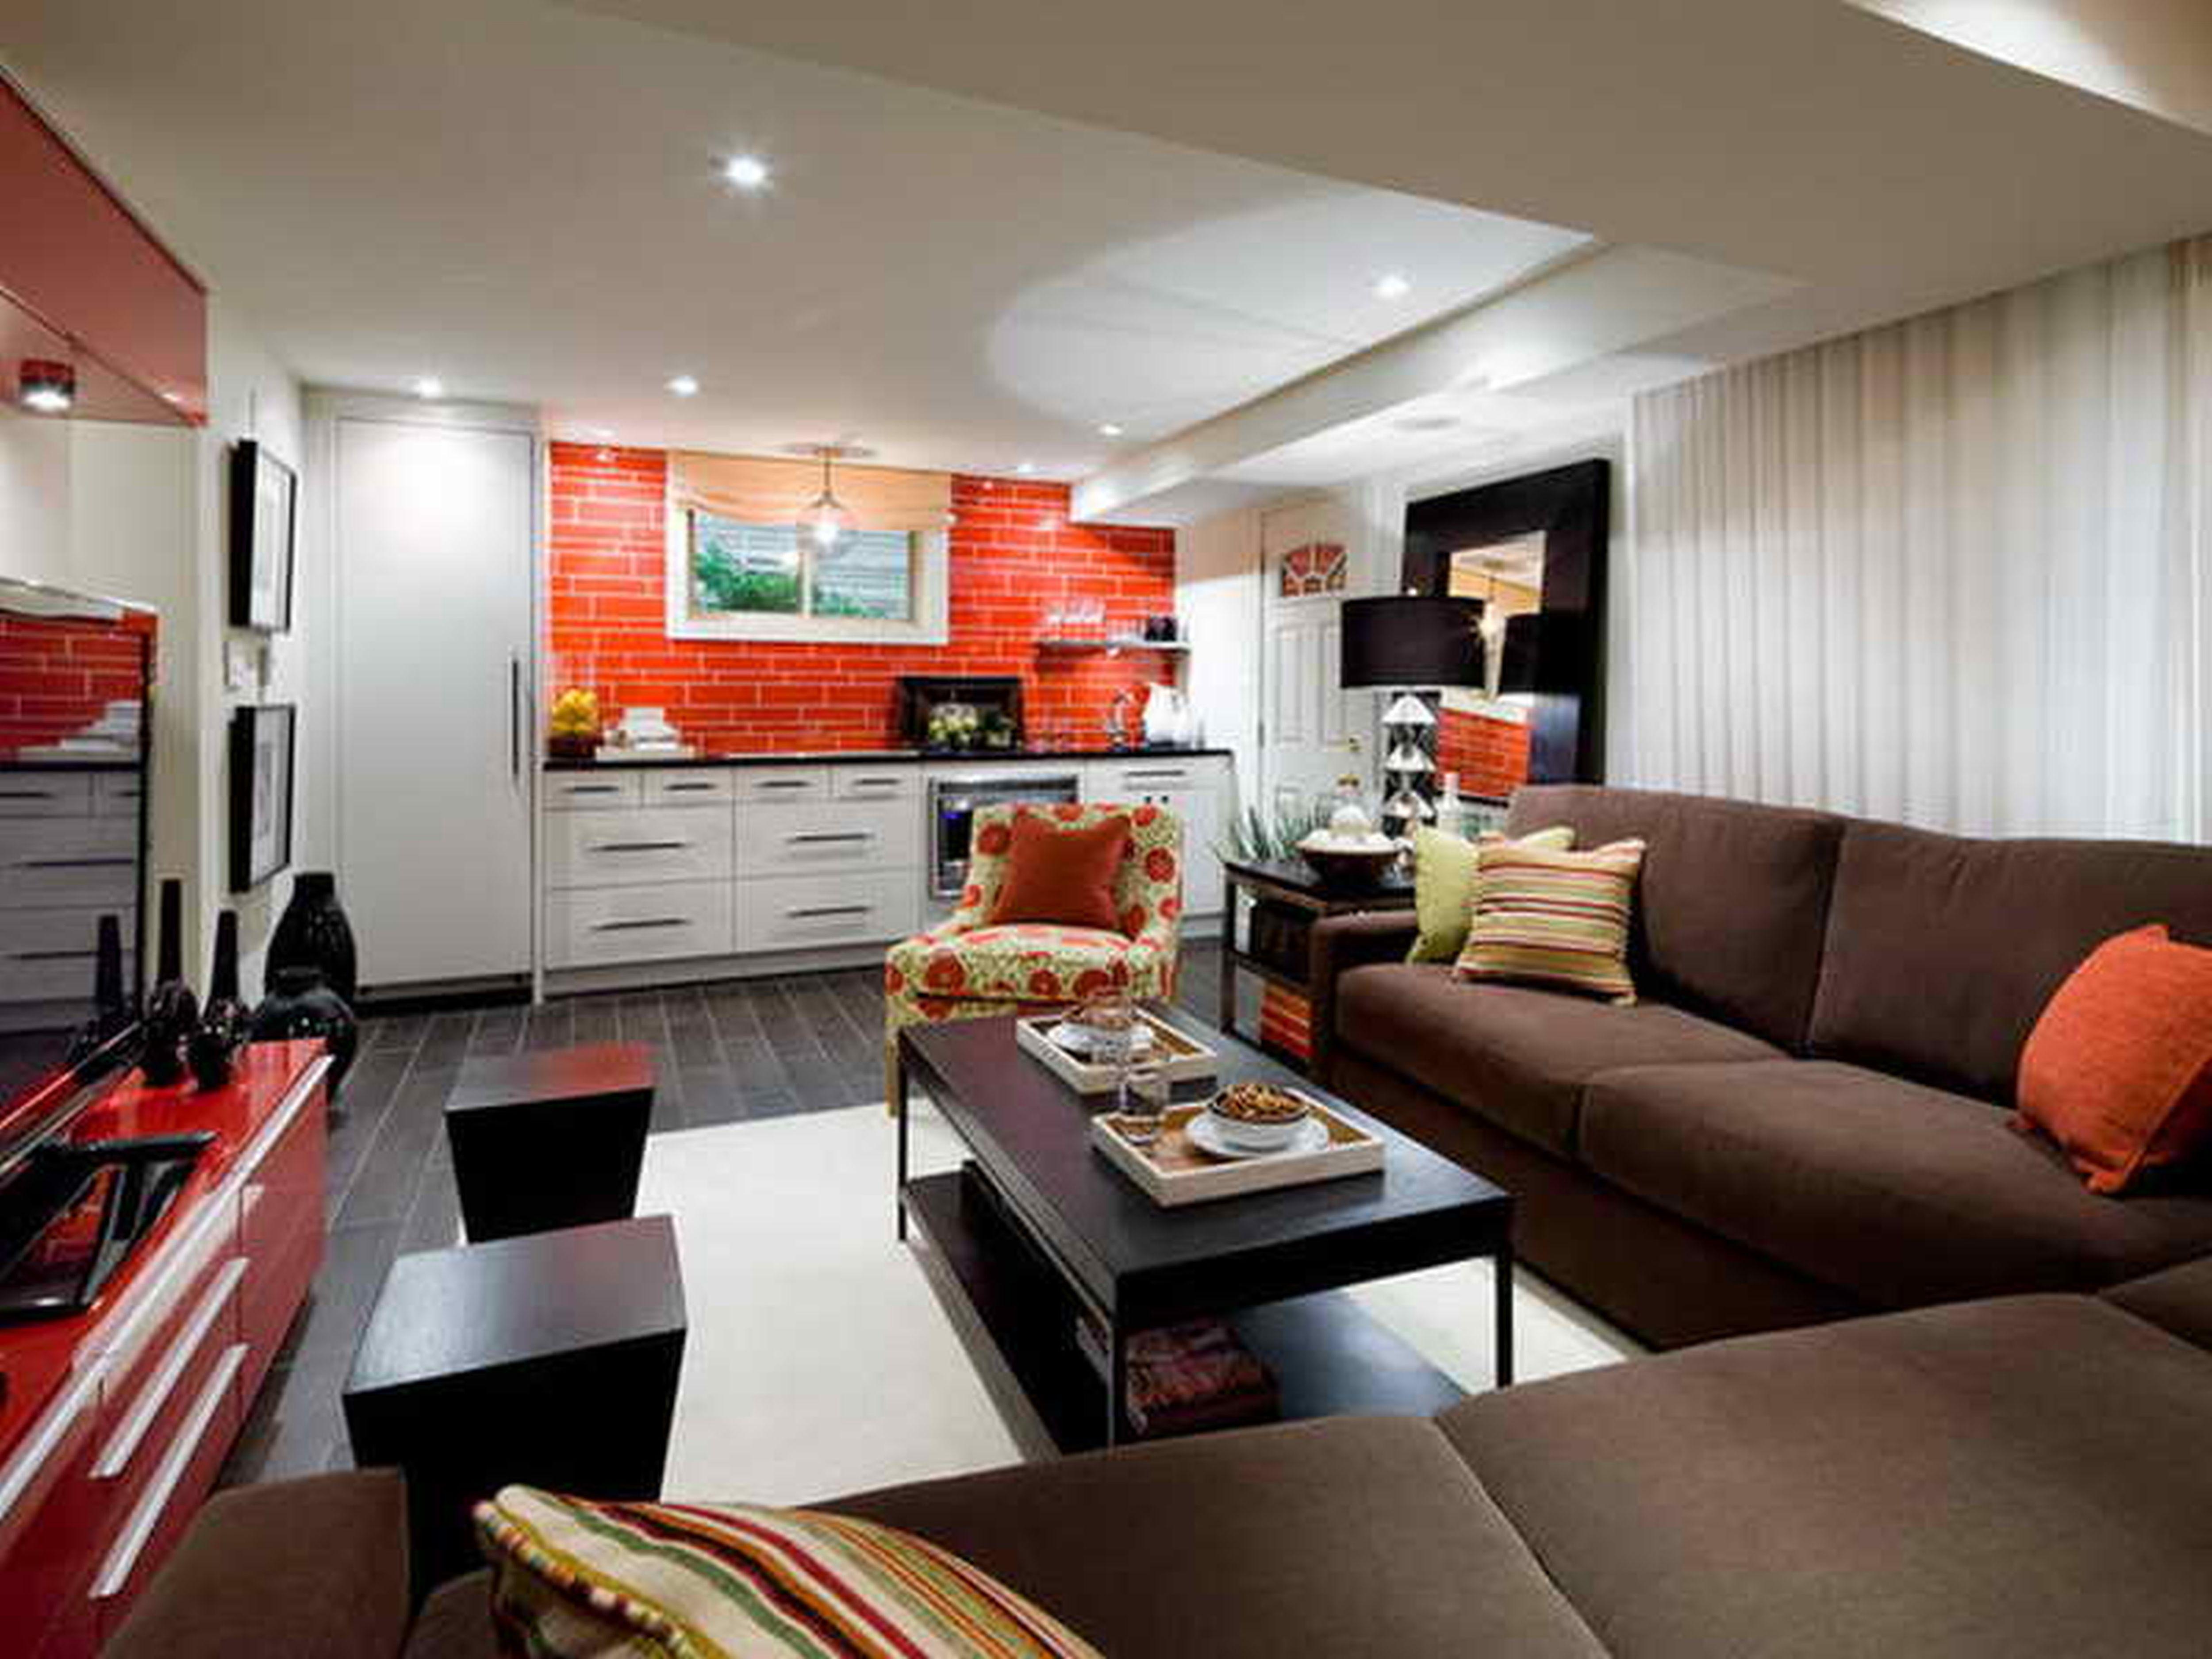 Basement-Color-Ideas-with-brown-sofaLuxury-Basement-Idea